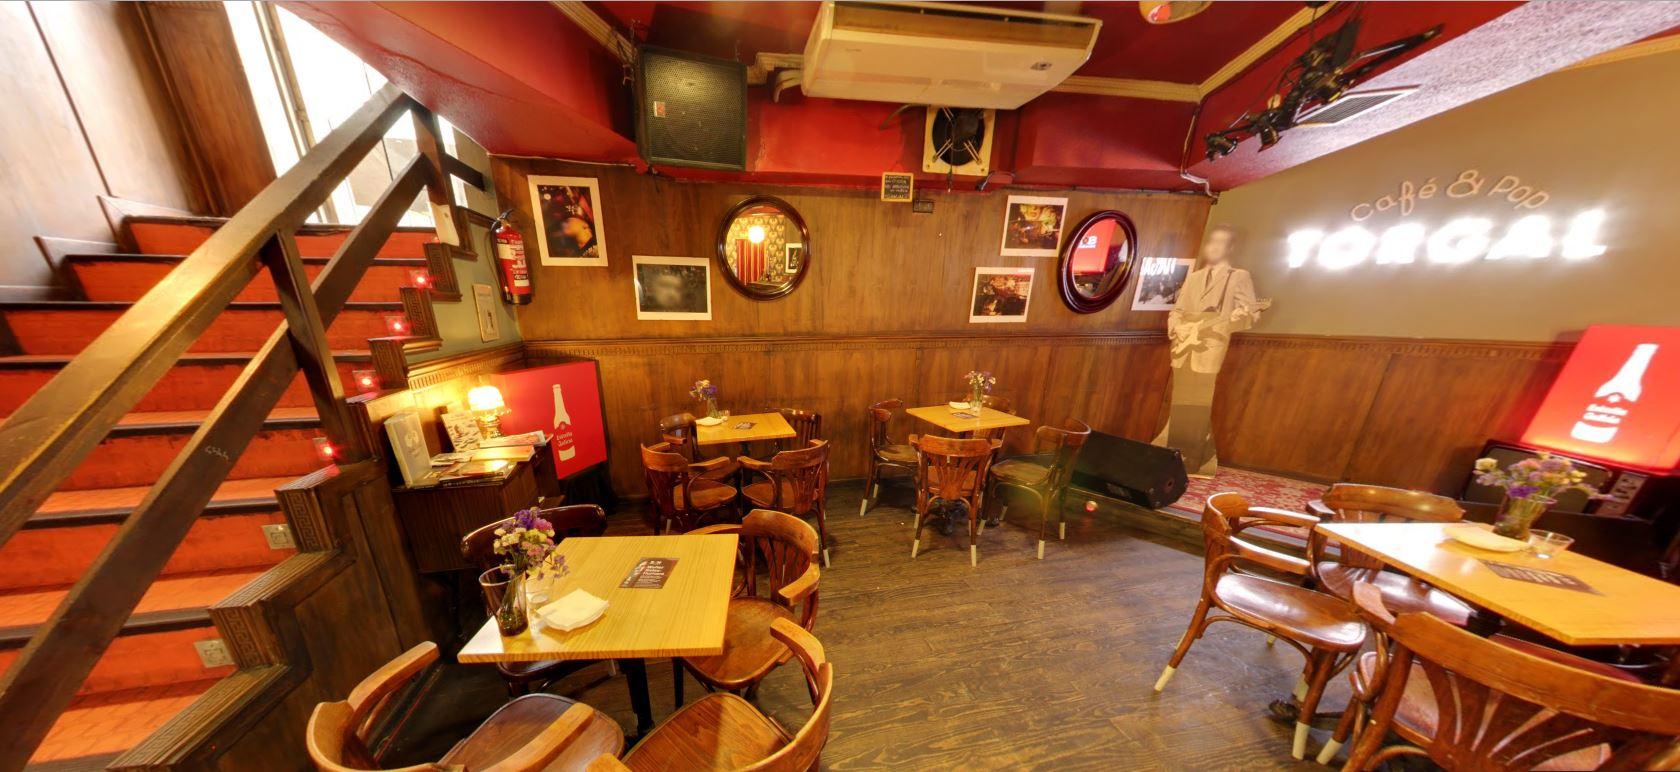 Cafe torgal ourense ourenseando